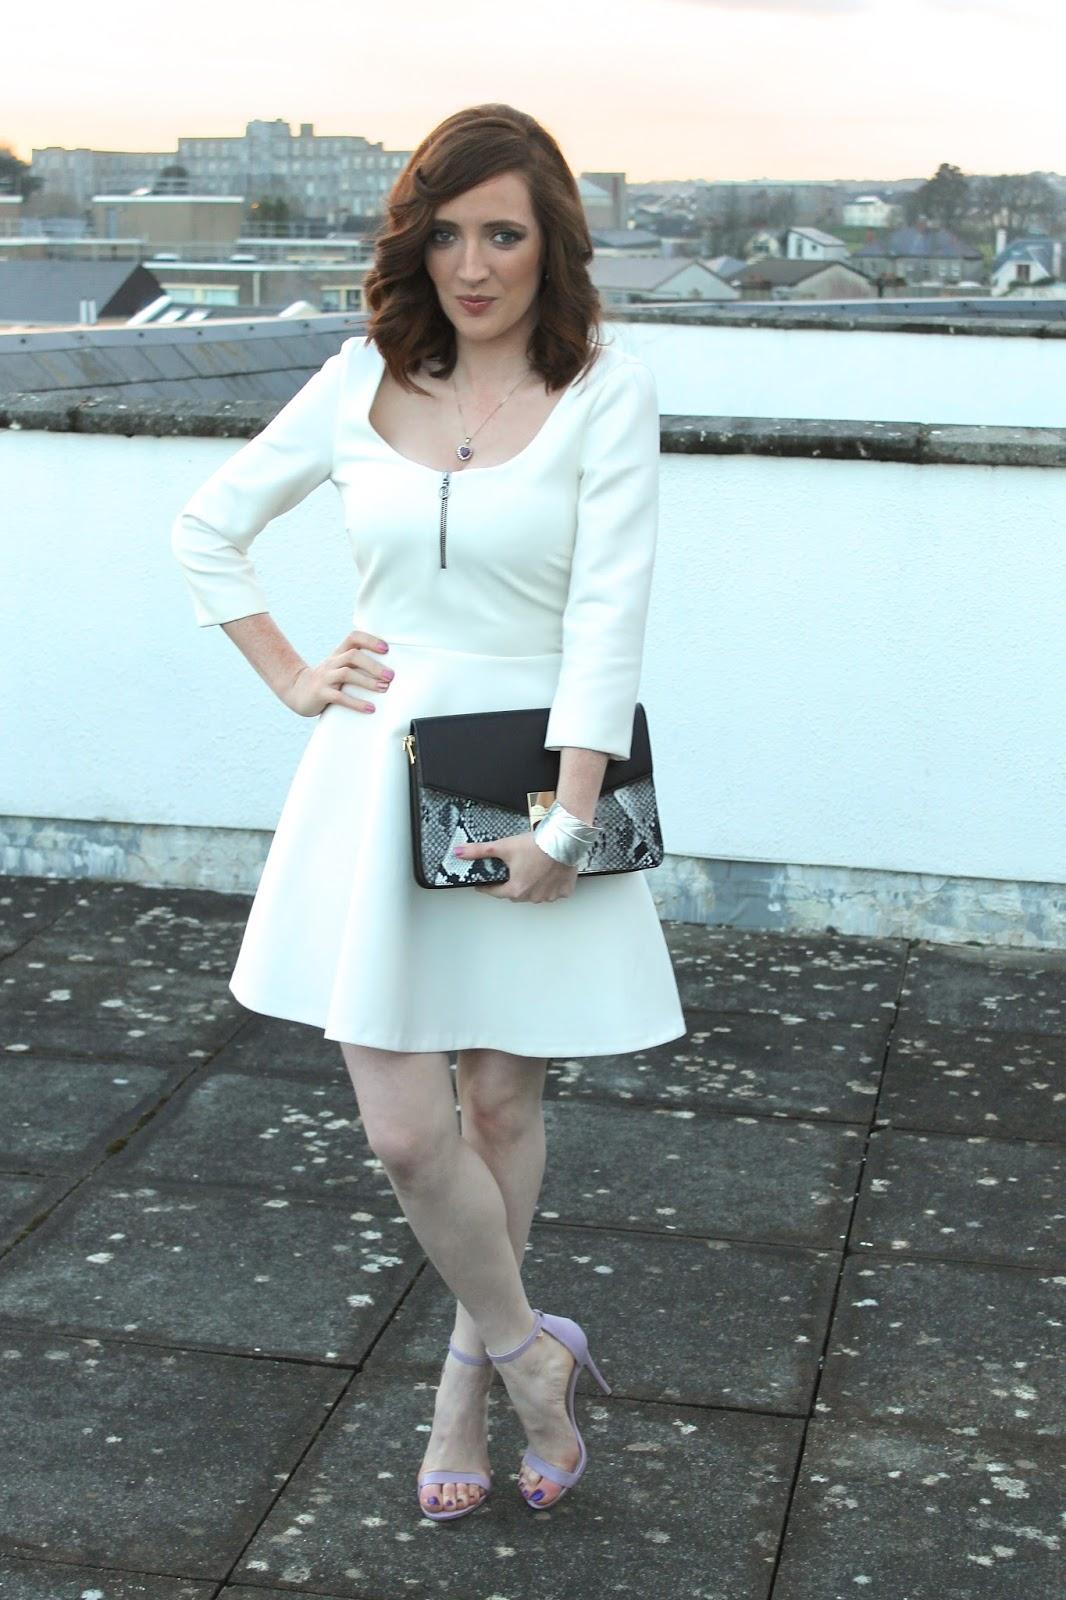 Bec Boop Irish Fashion innovation awards 2015 outfit